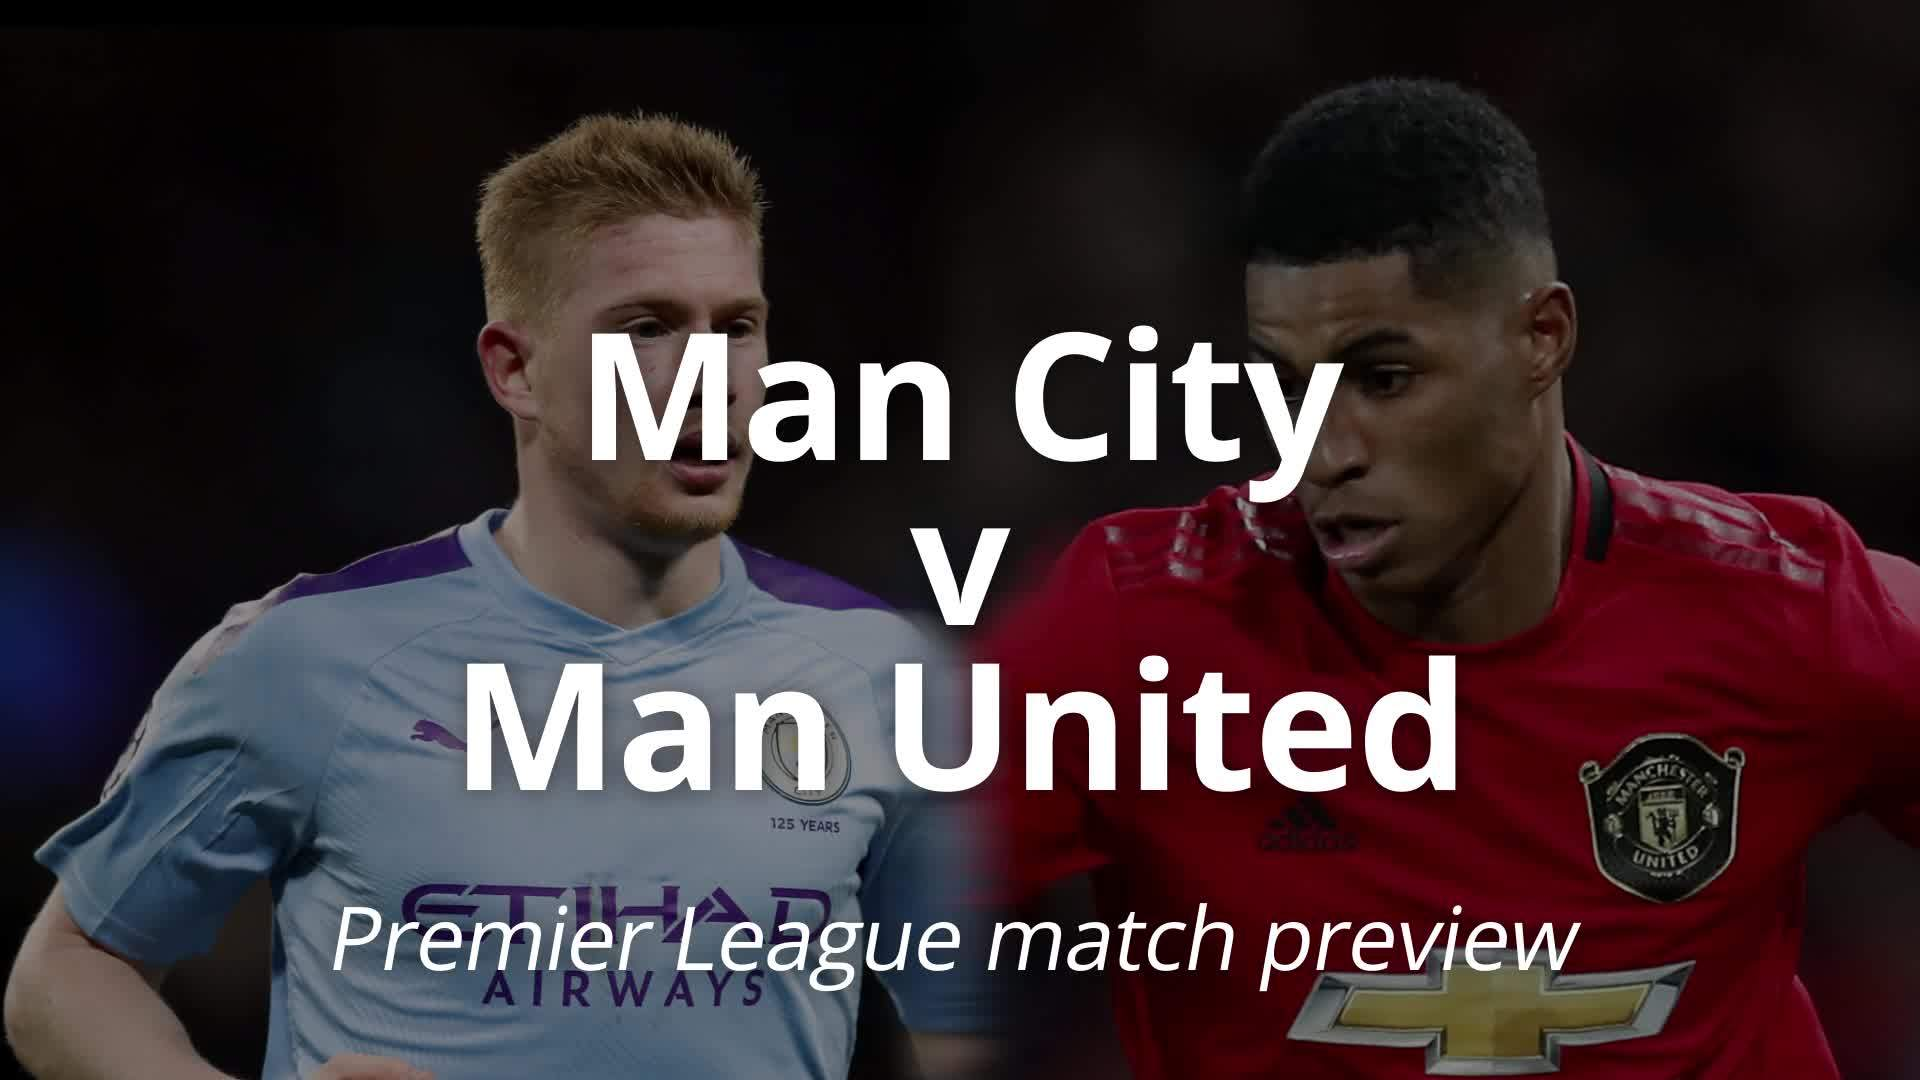 man city vs man united - photo #17